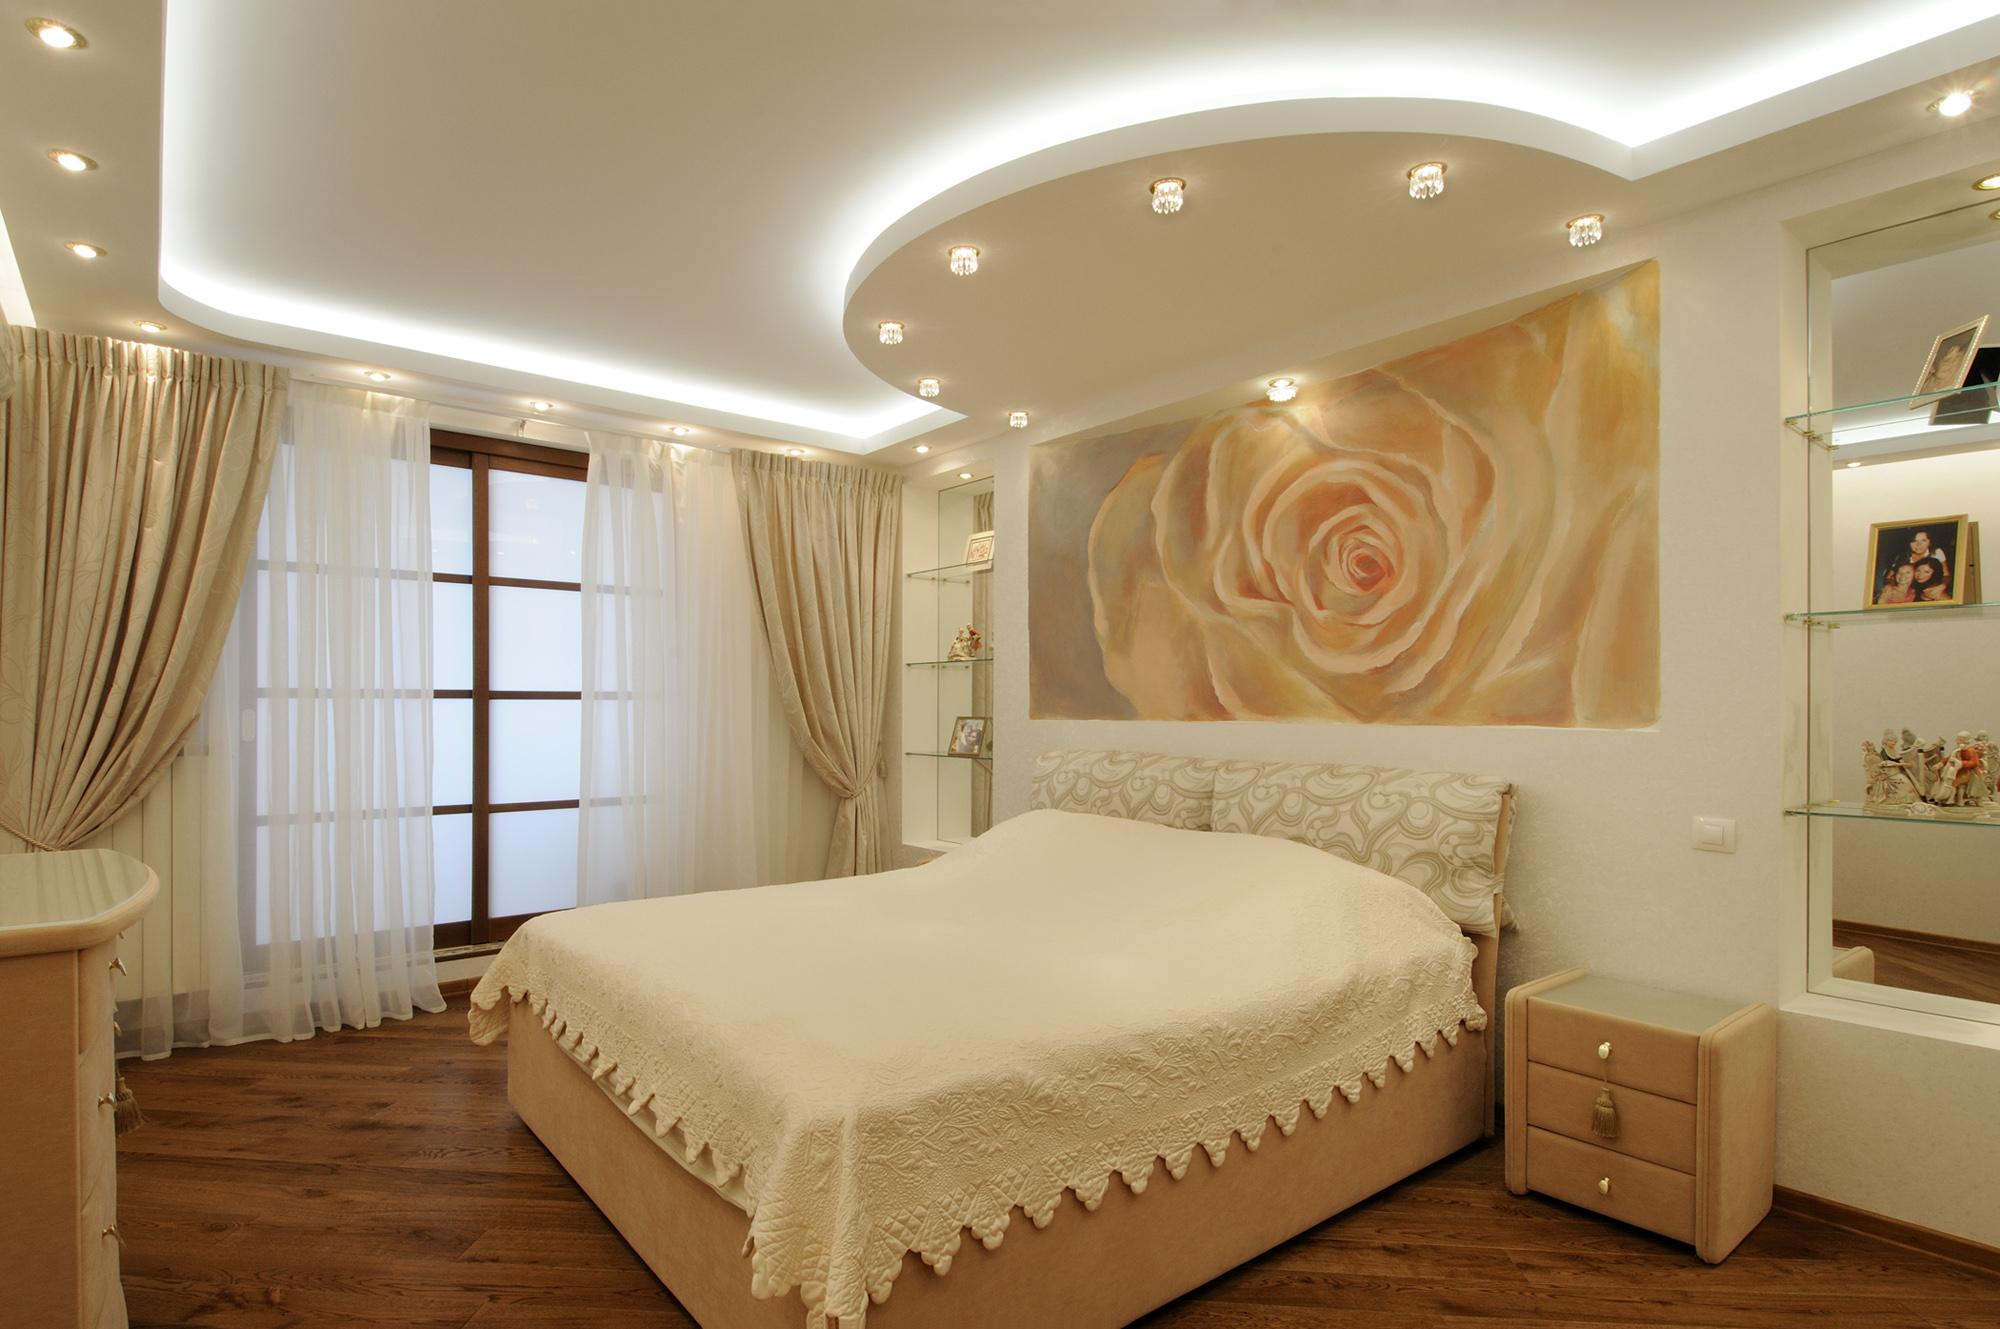 Фото потолок для спальни своими руками